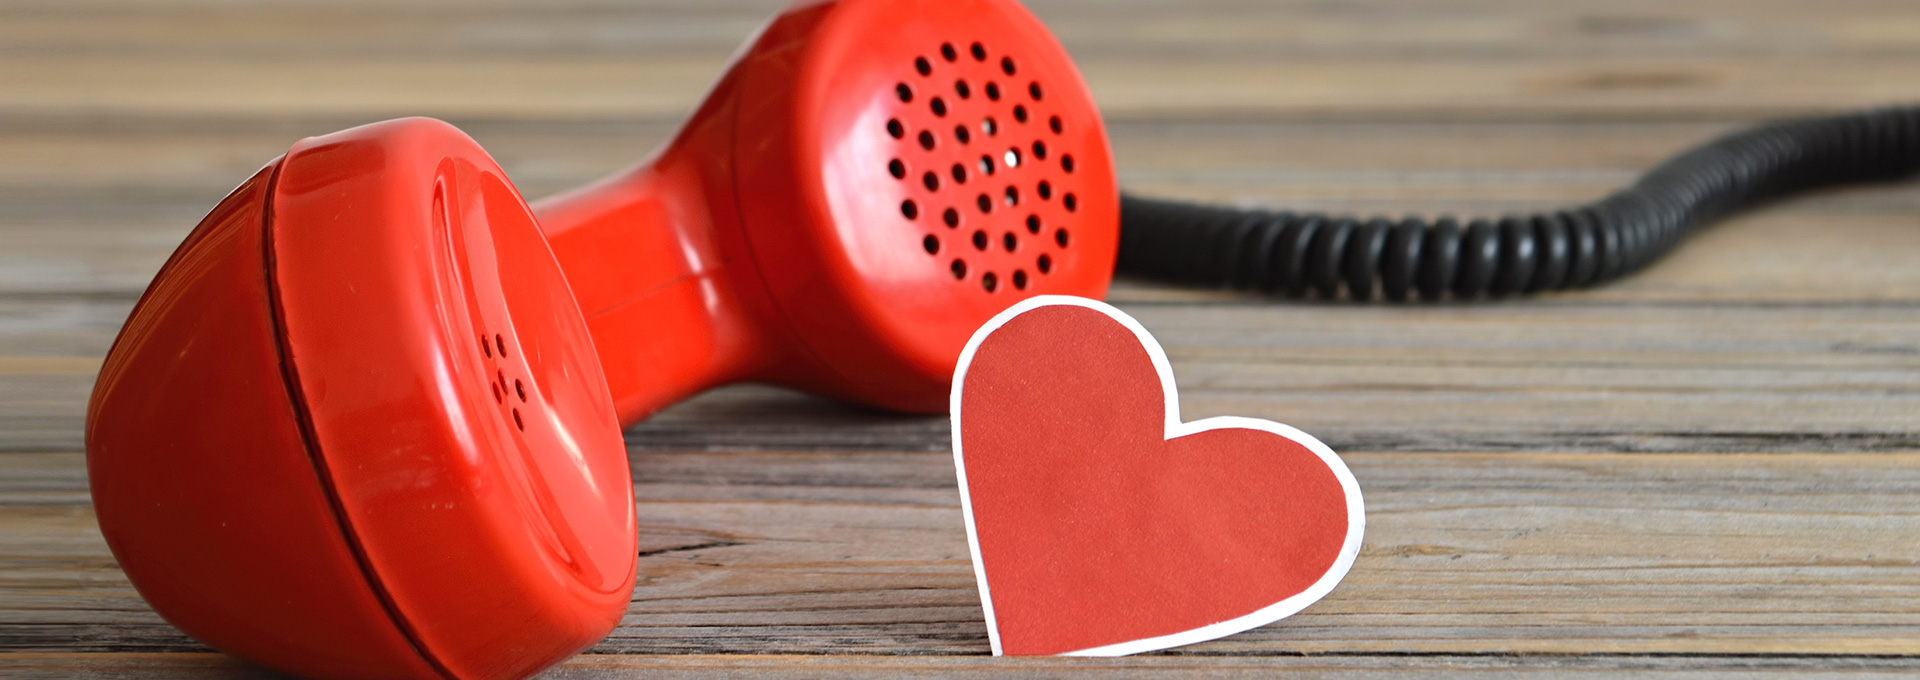 Customer Experience: Talk to the Heart